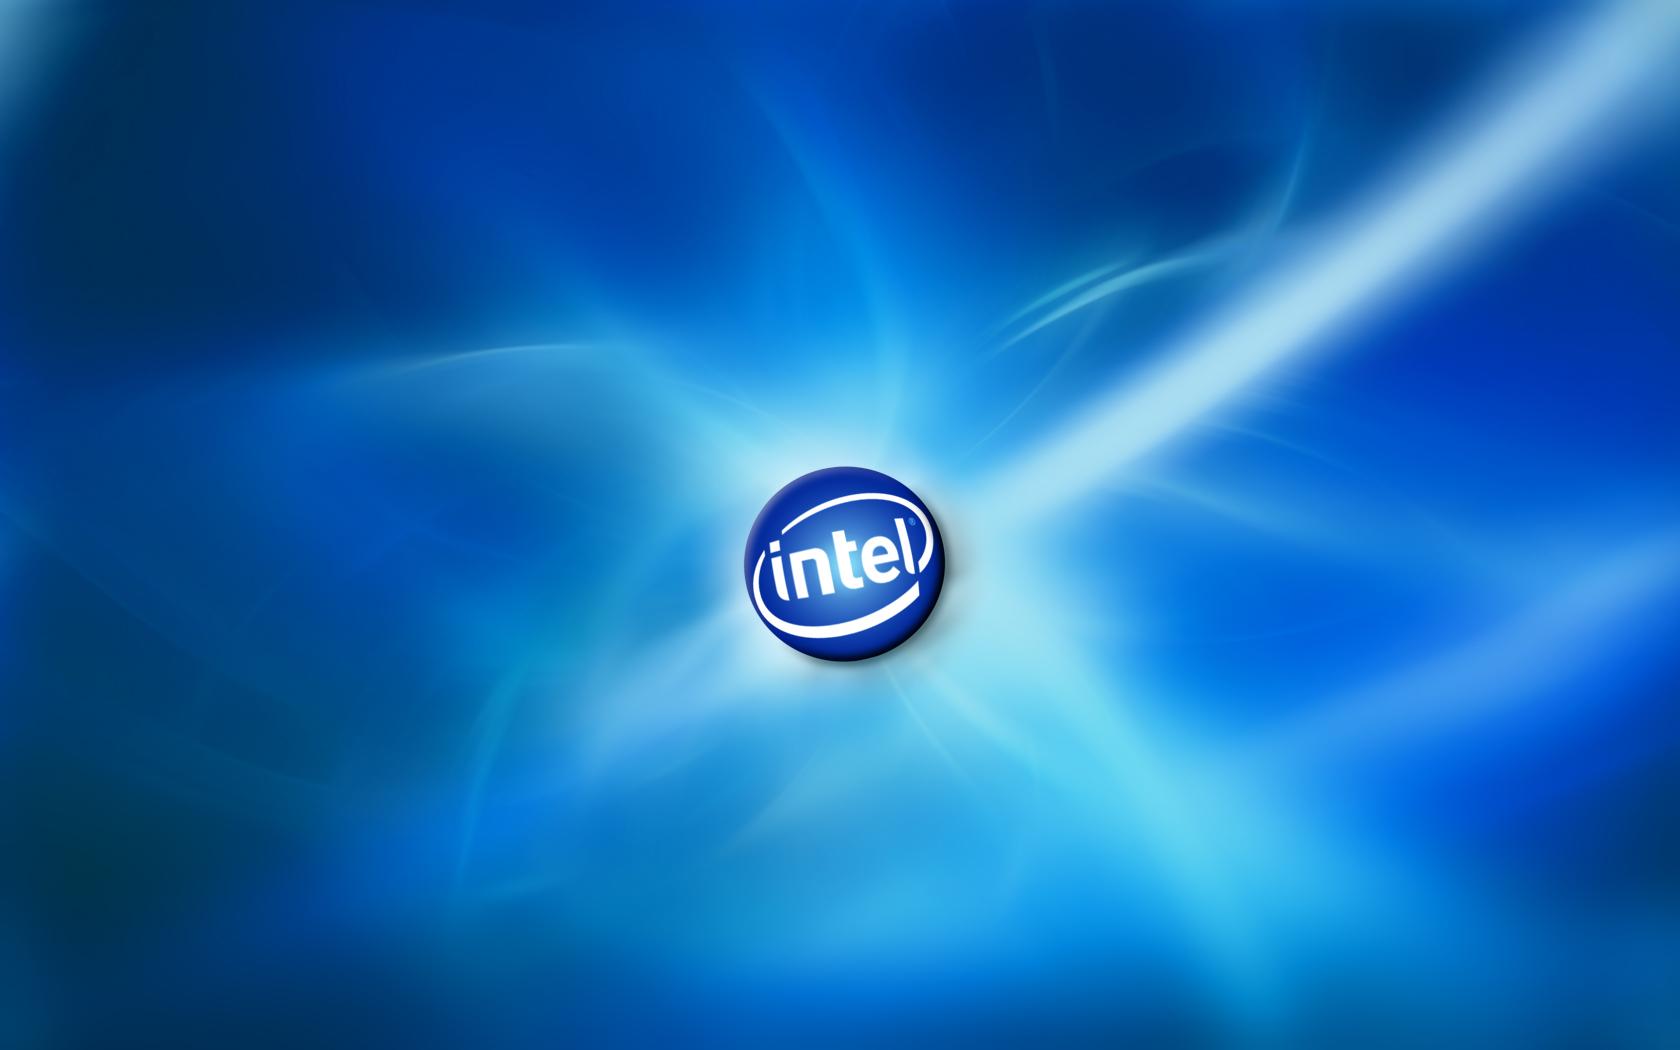 Intel может купить MediaTek за $27 млрд